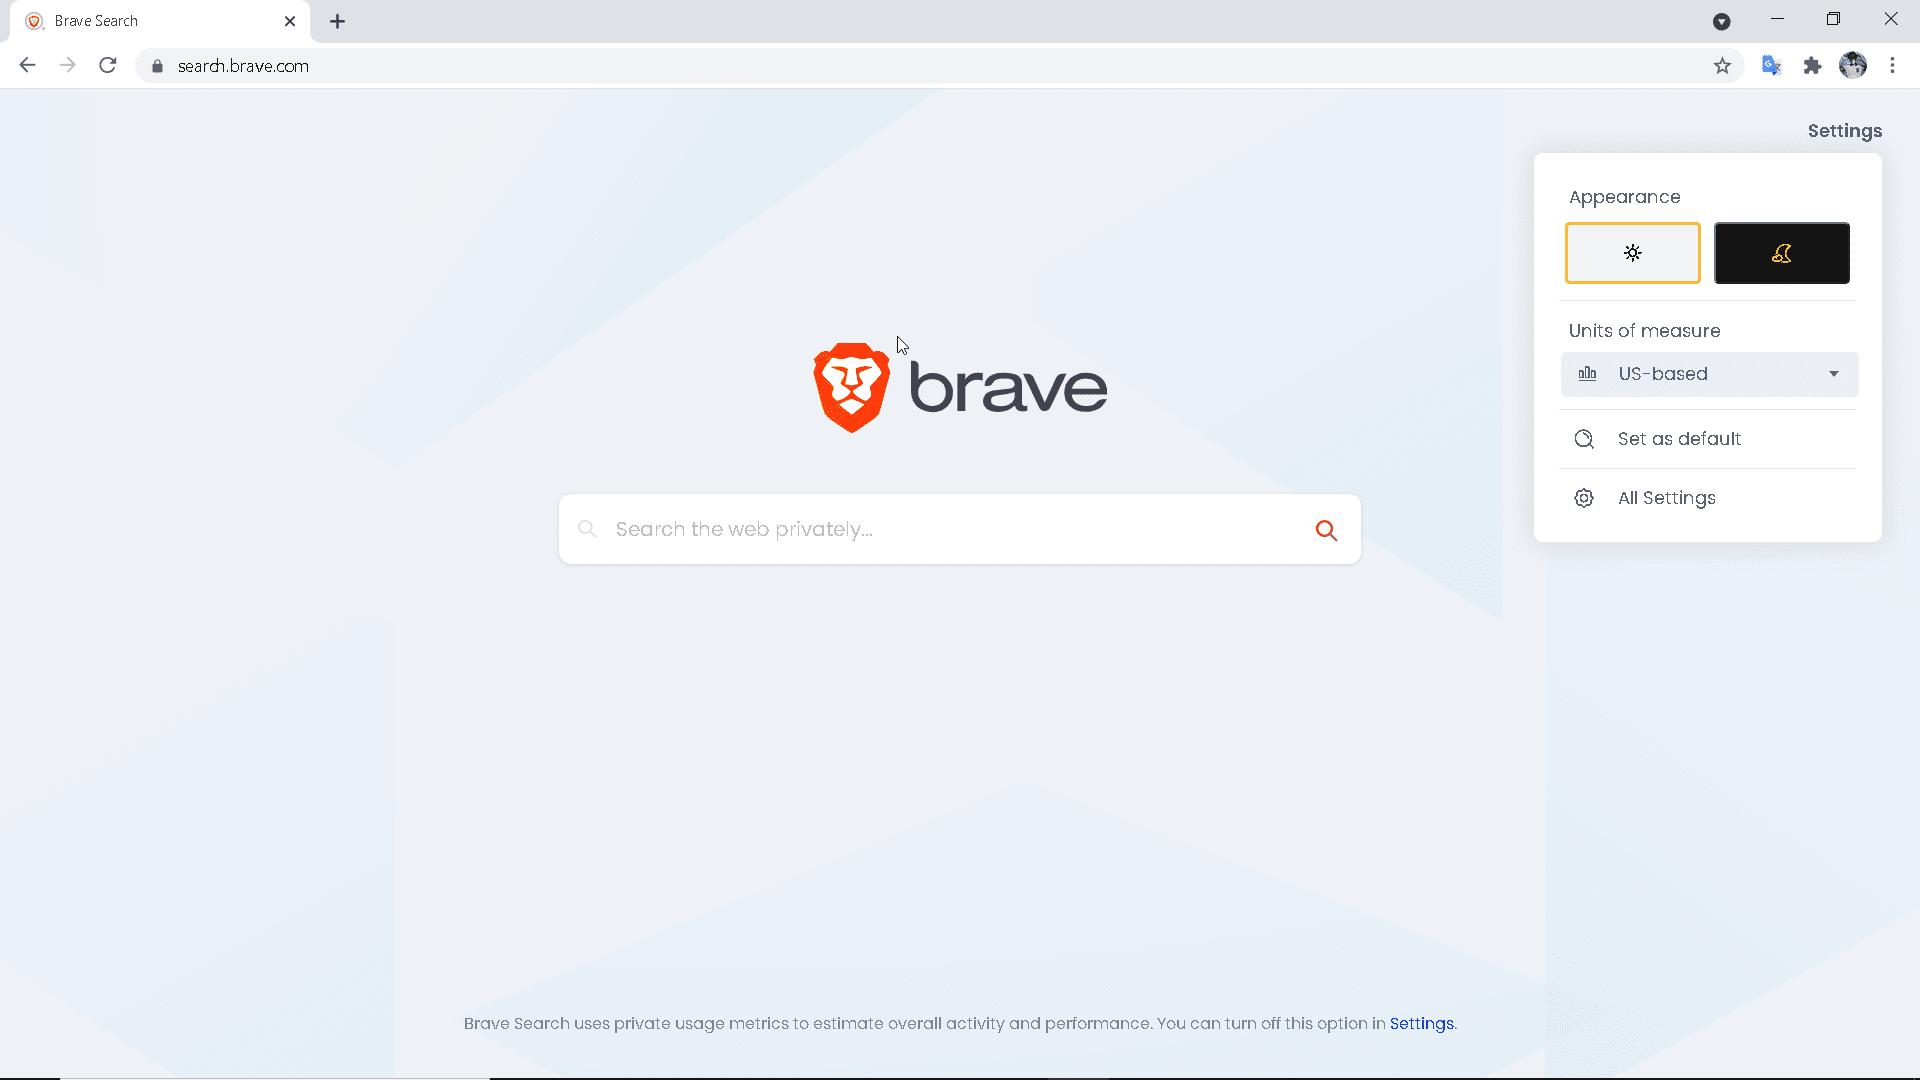 Brave Search Engine Appearance - TechneSiyam